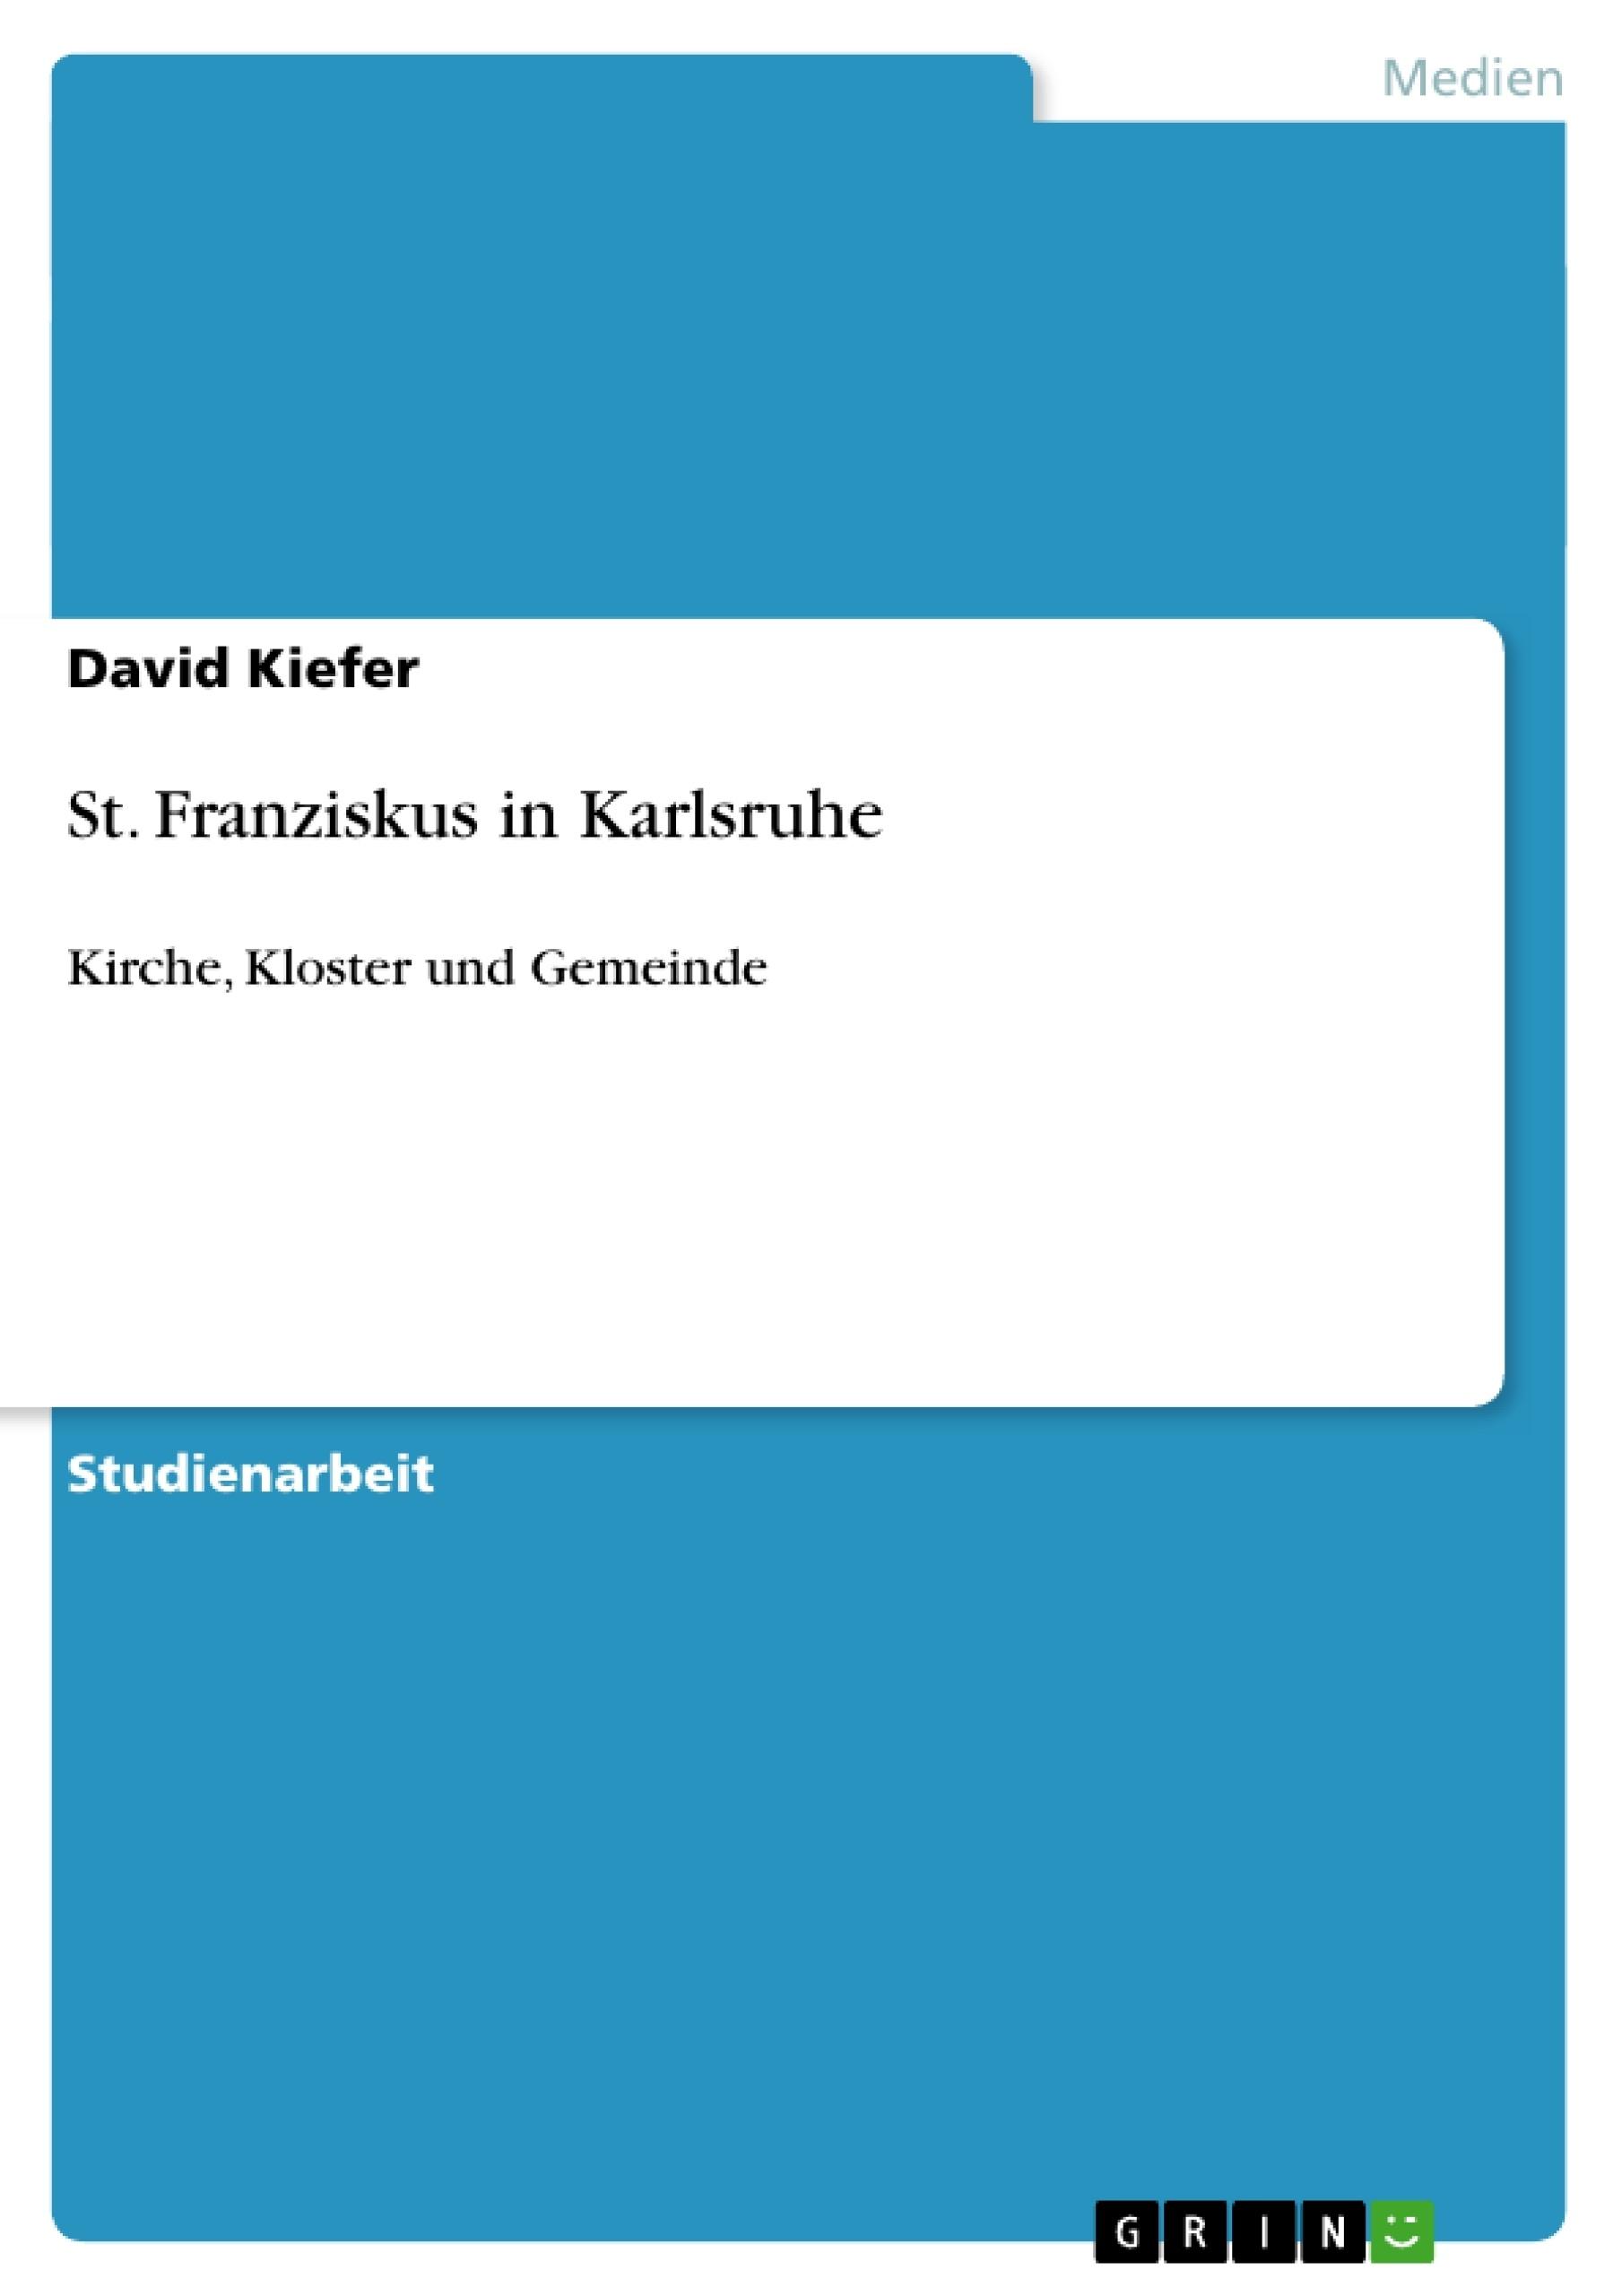 Titel: St. Franziskus in Karlsruhe